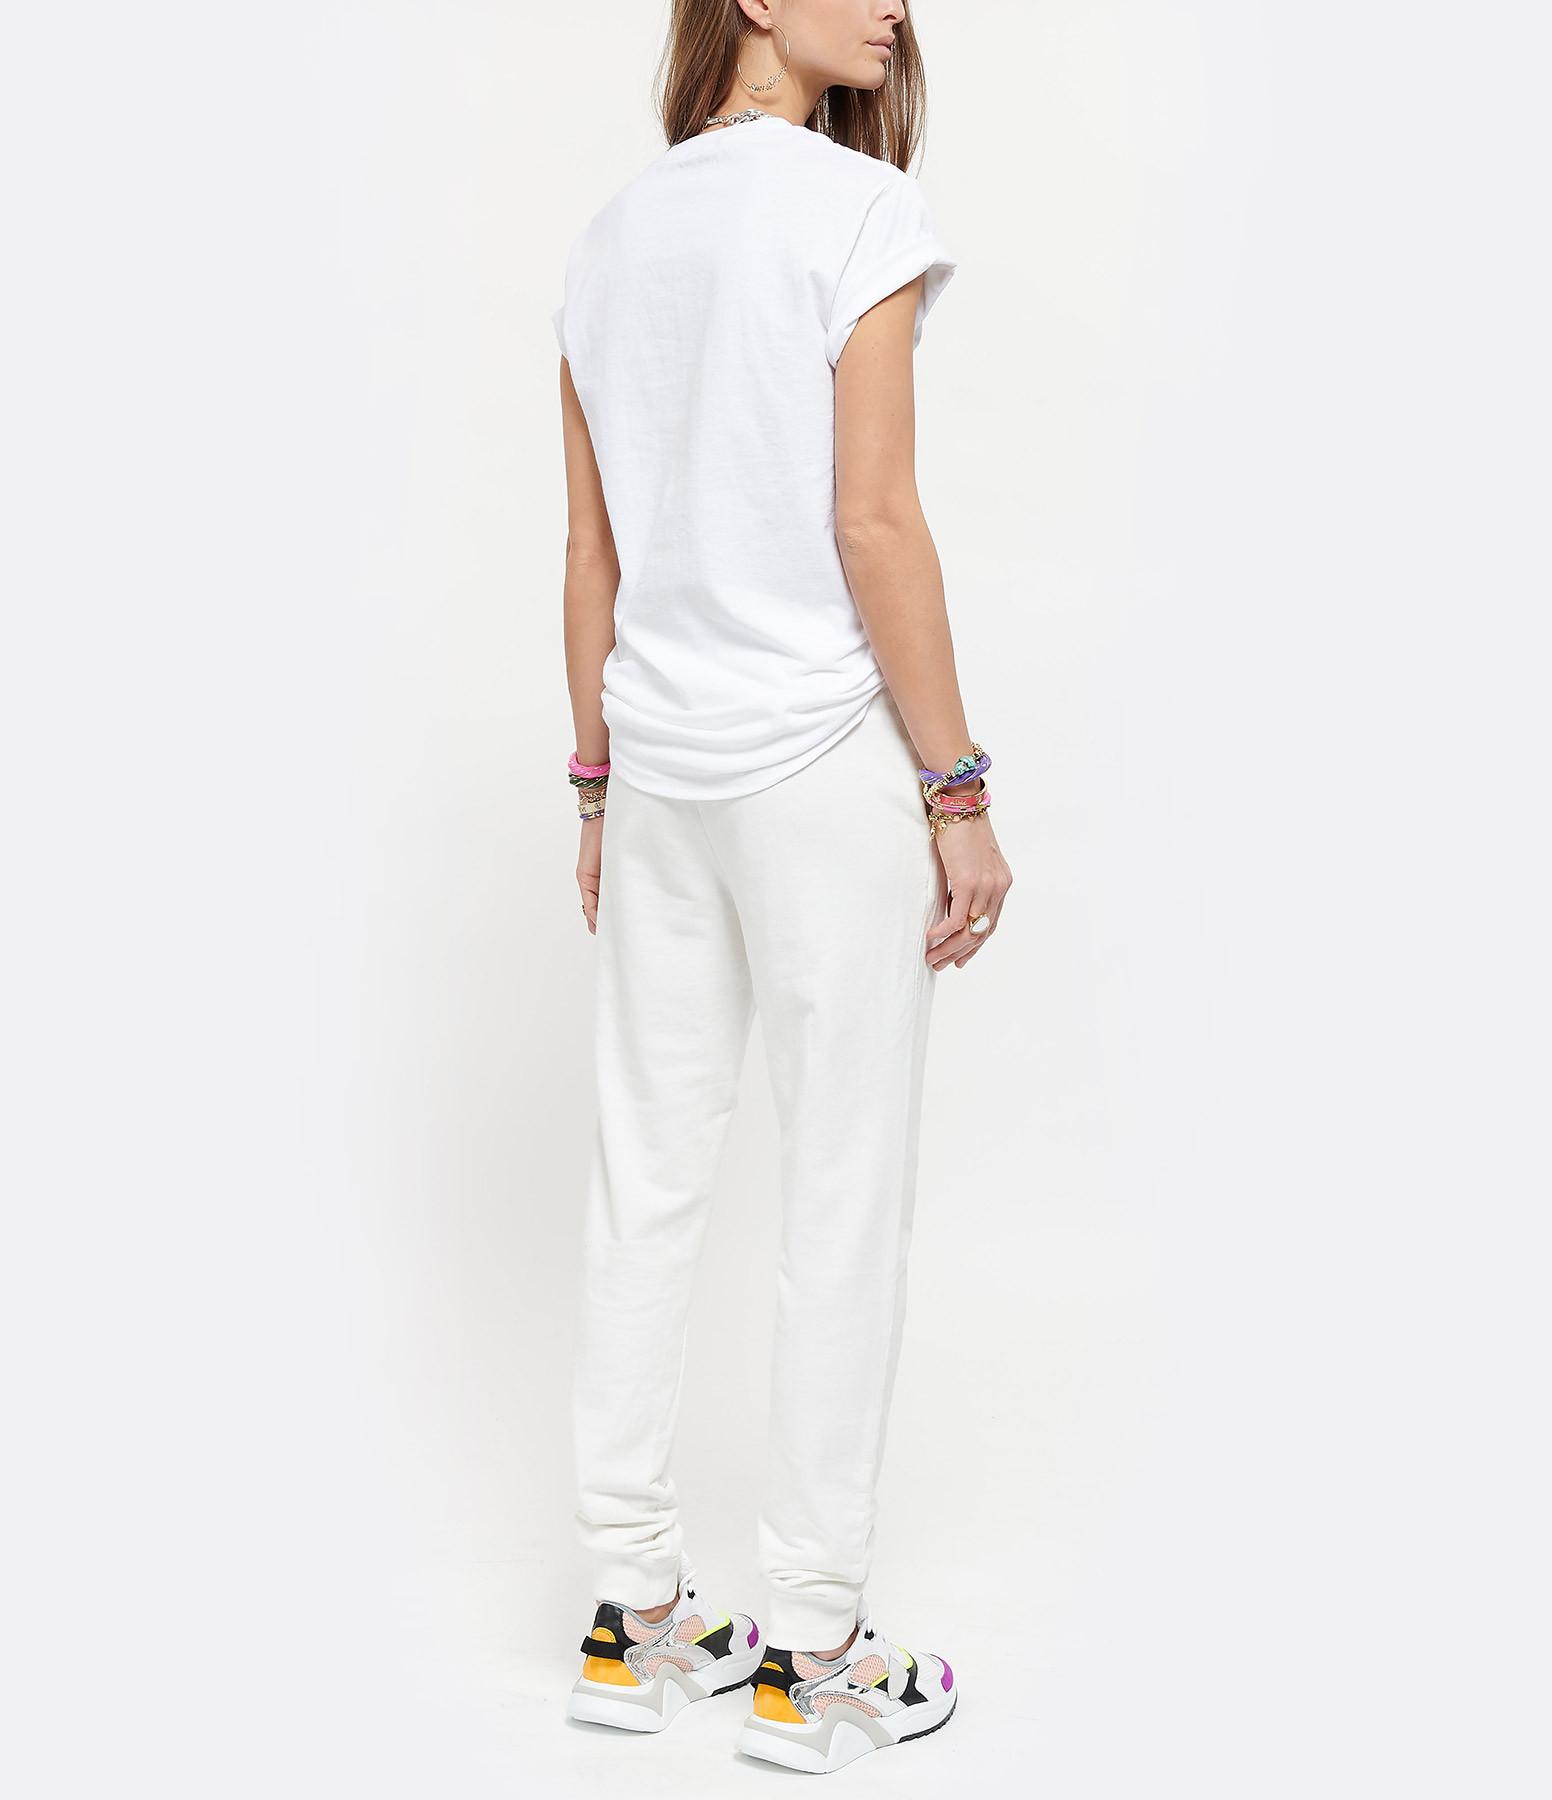 NEWTONE - Tee-shirt Wings Coton Blanc